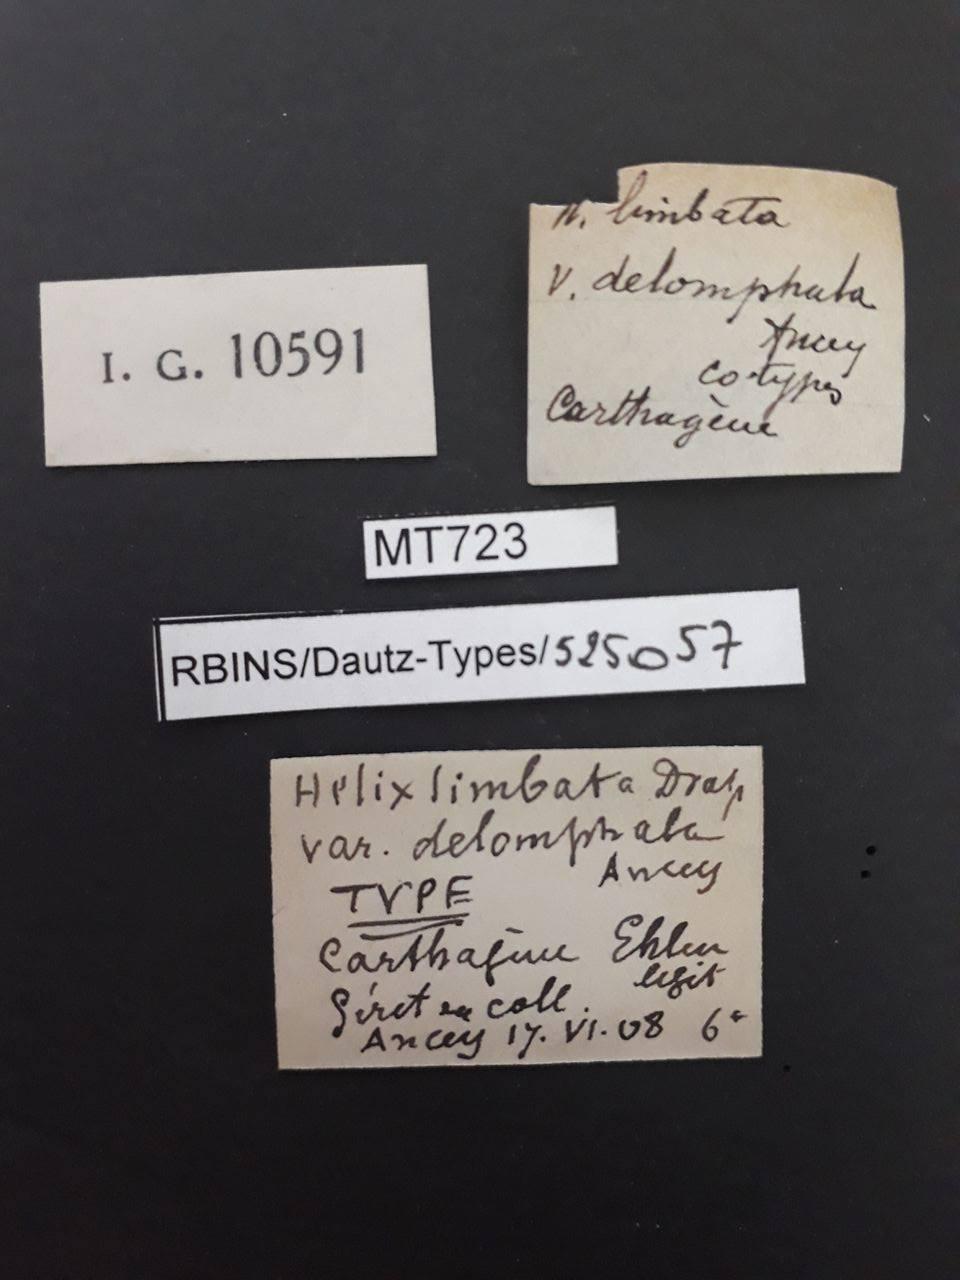 BE-RBINS-INV COTYPE MT 723 Helix (Fruticicola) limbata var. delomphala LABELS.jpg